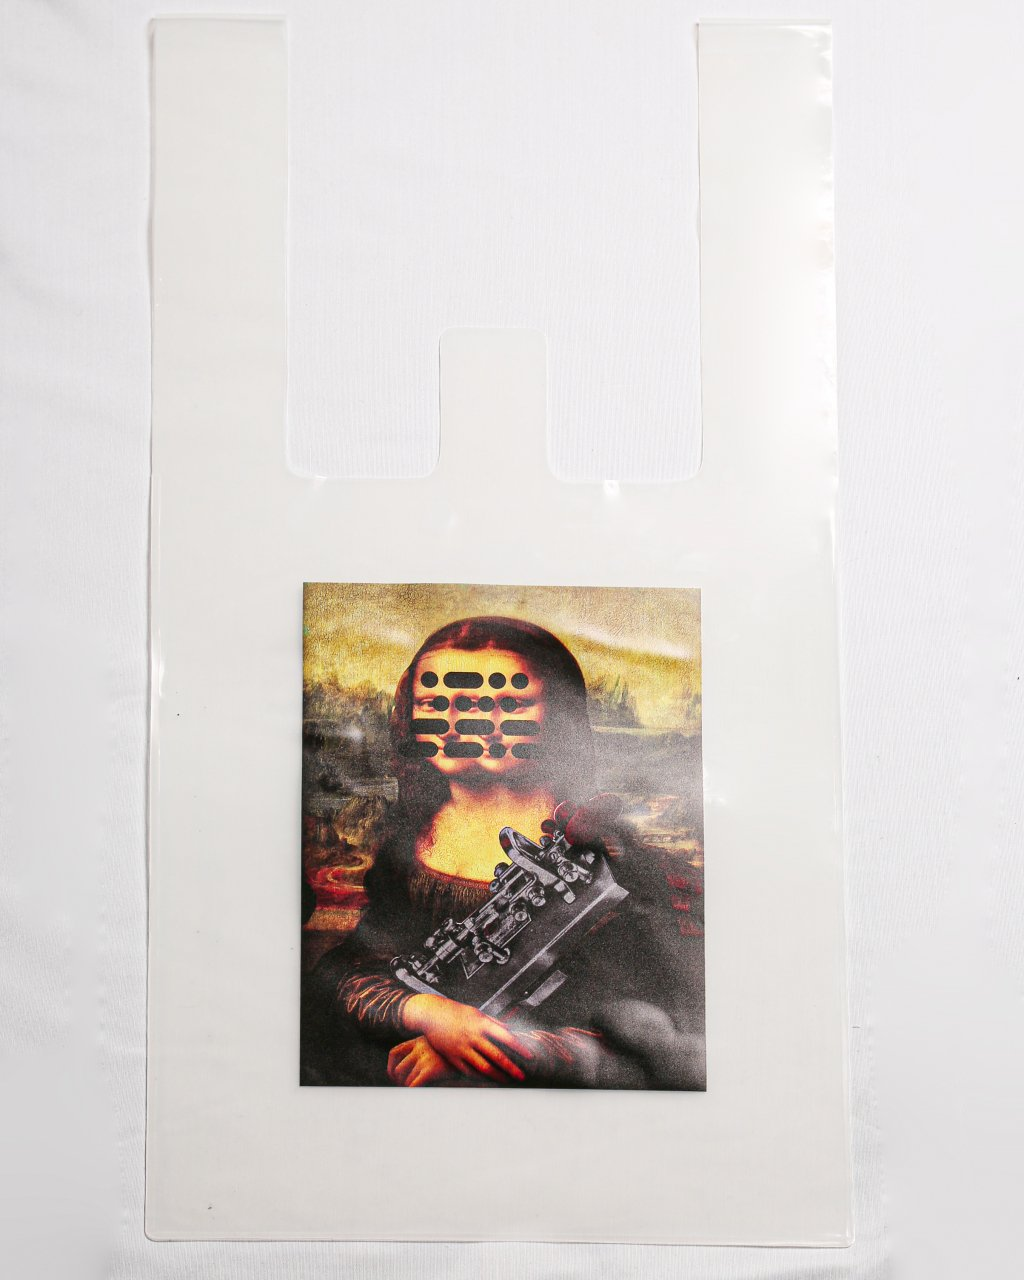 PVC bag(collage by Q-TA)